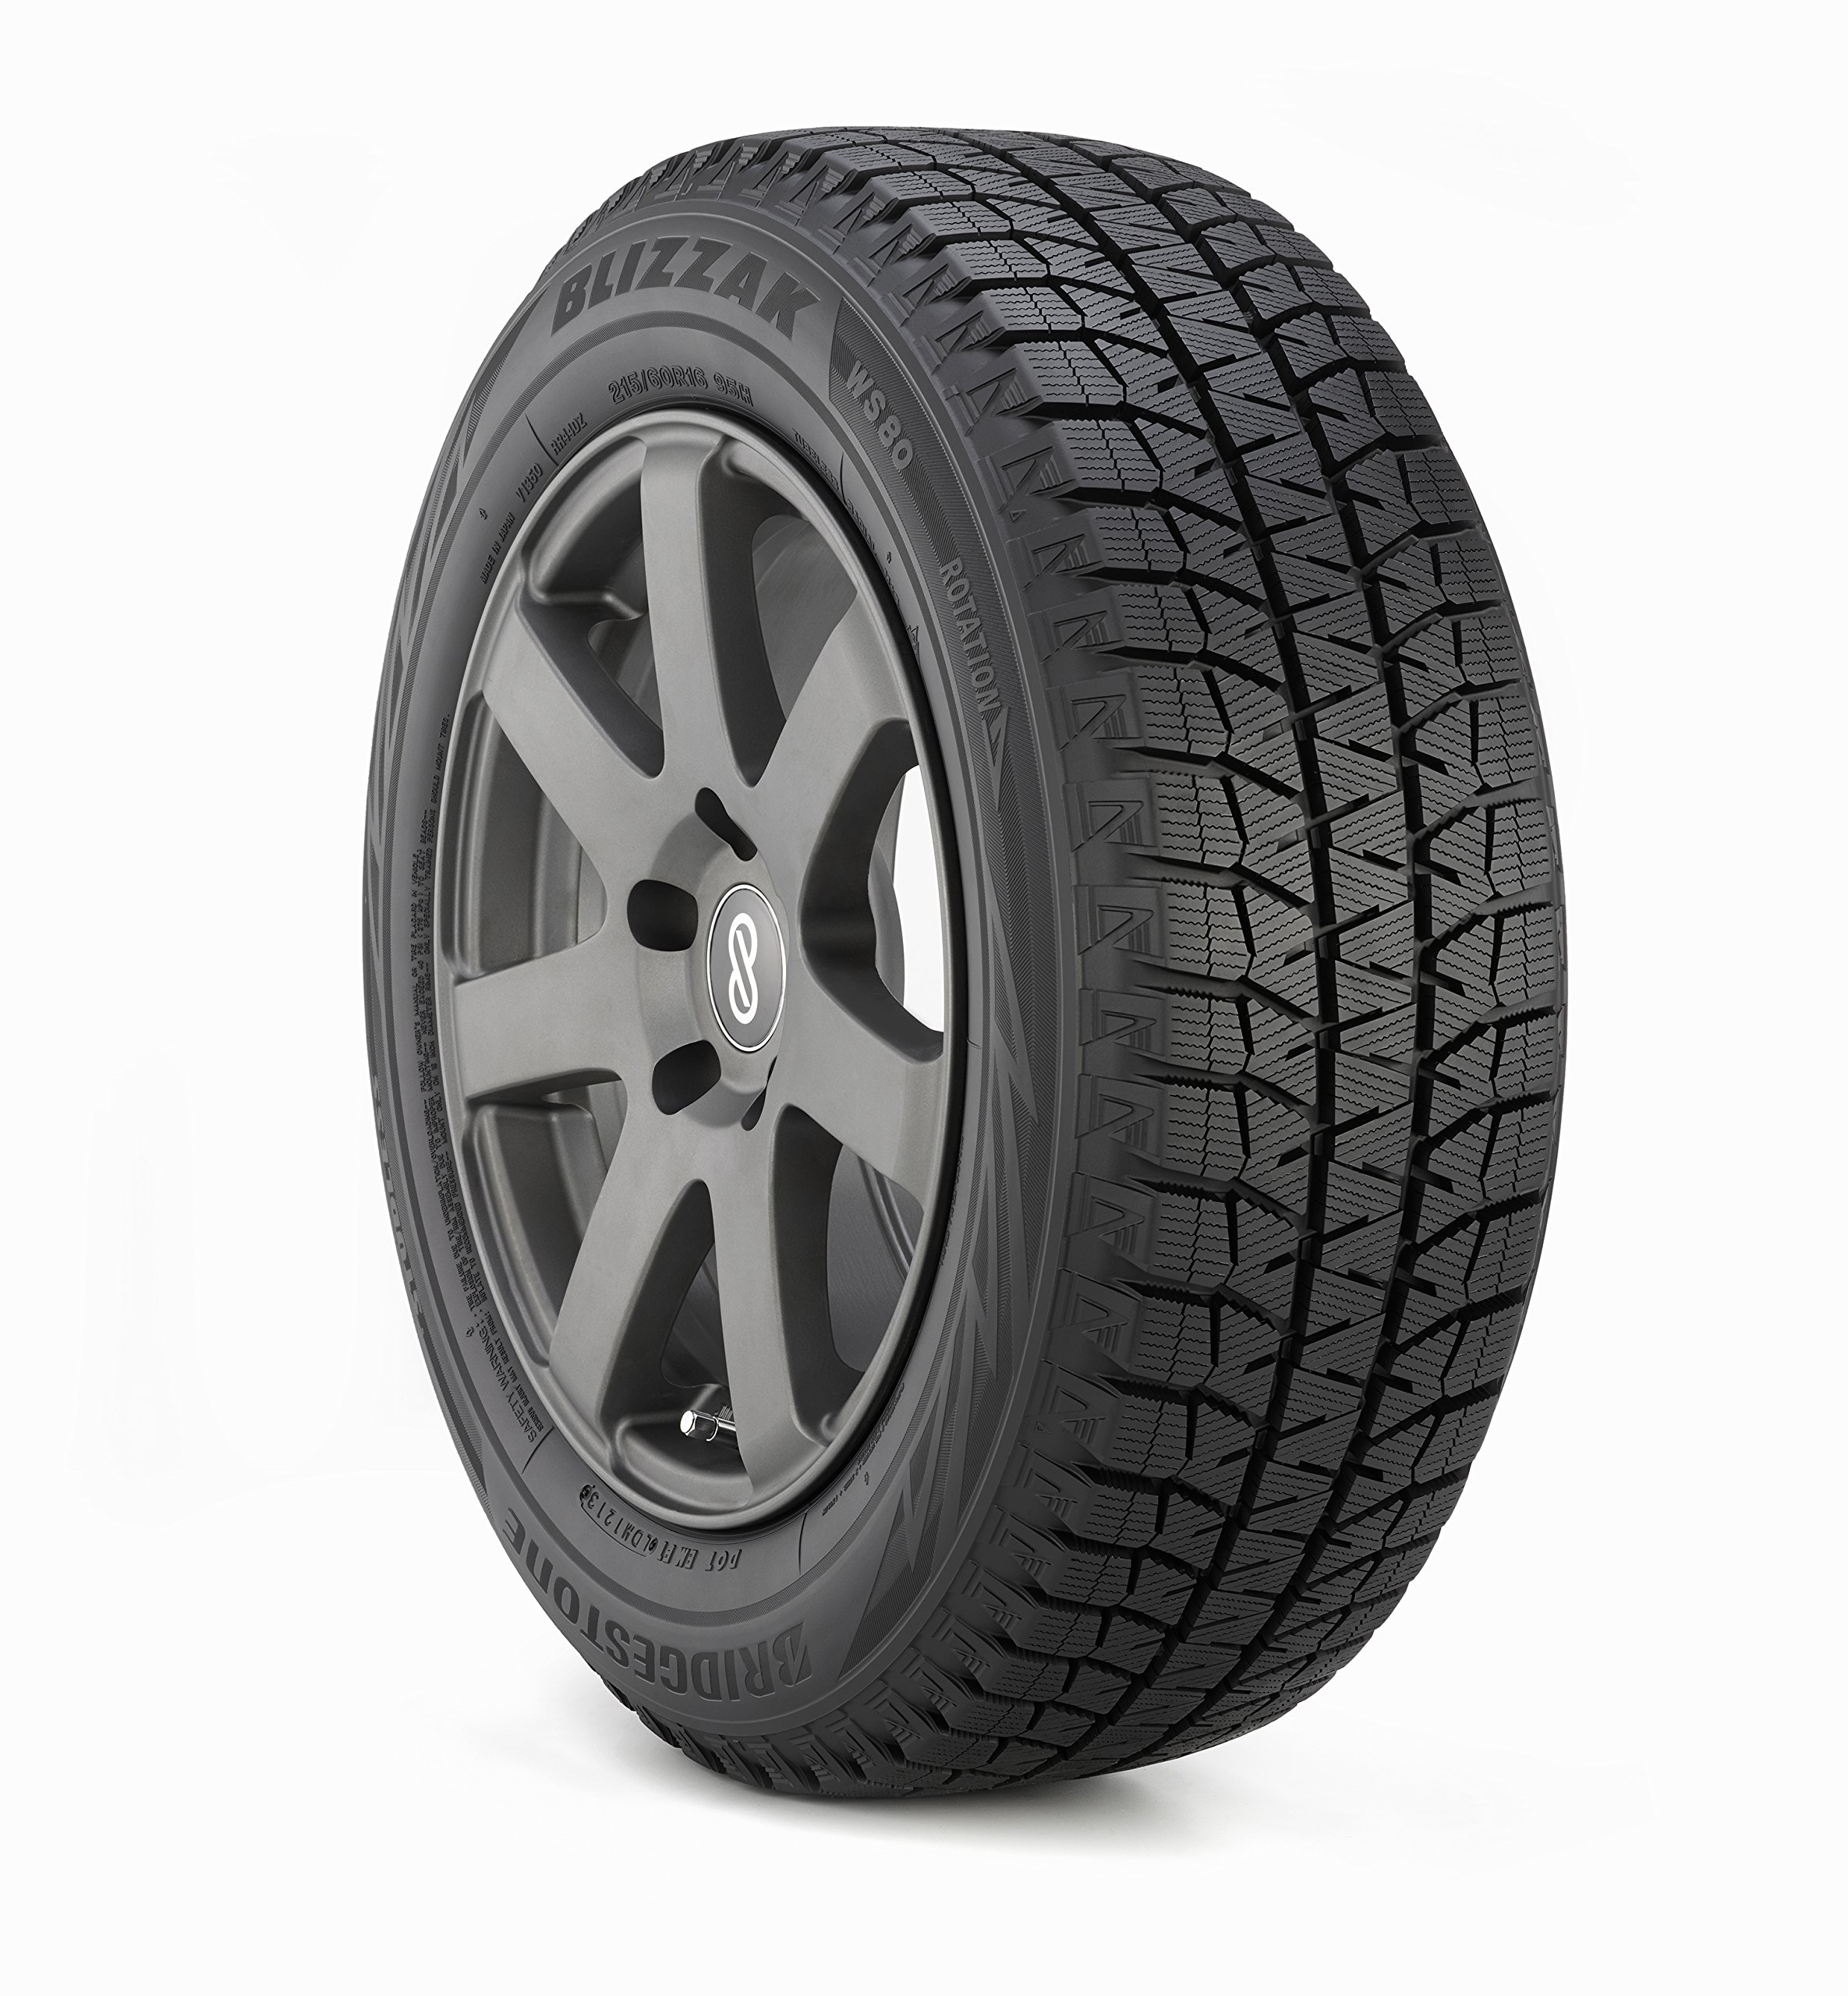 Bridgestone Blizzak WS80 Winter Radial Tire - 175/65R15 84H